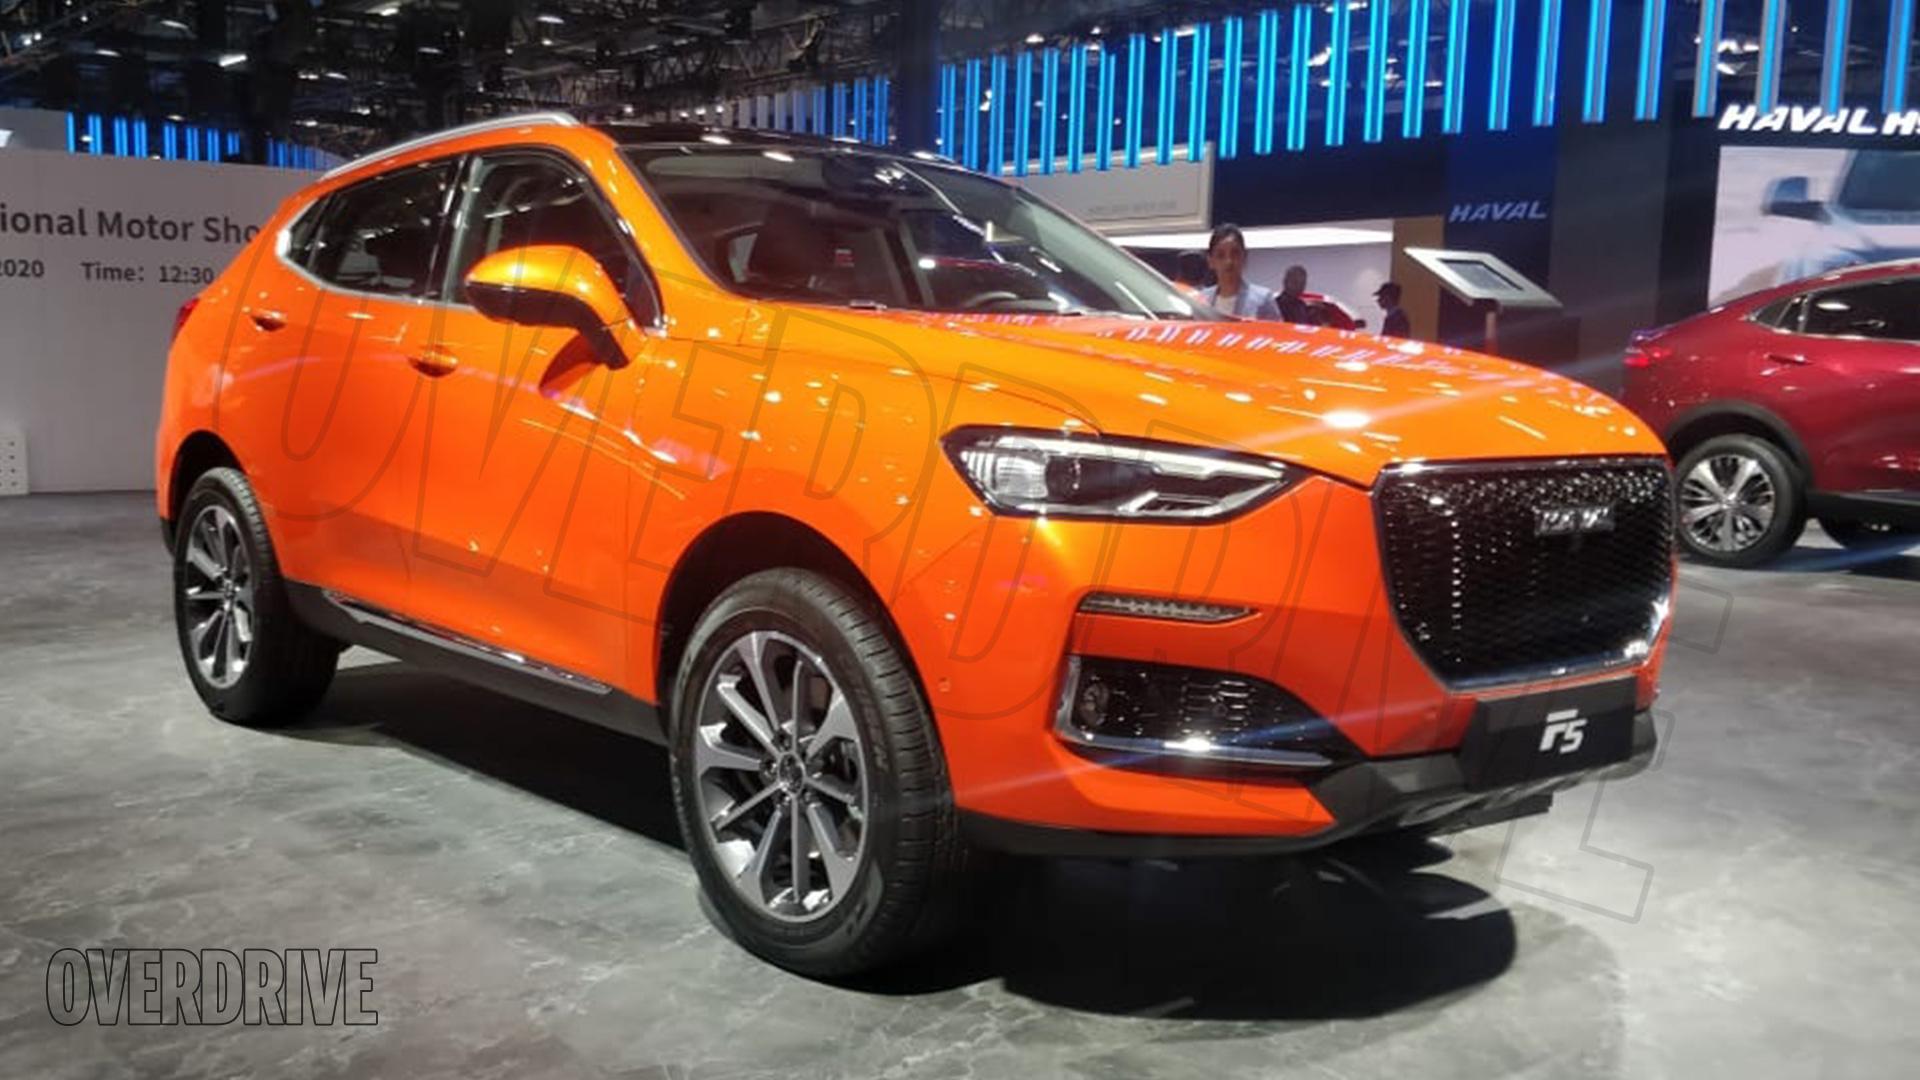 Great Wall Motor Haval F5 2020 STD